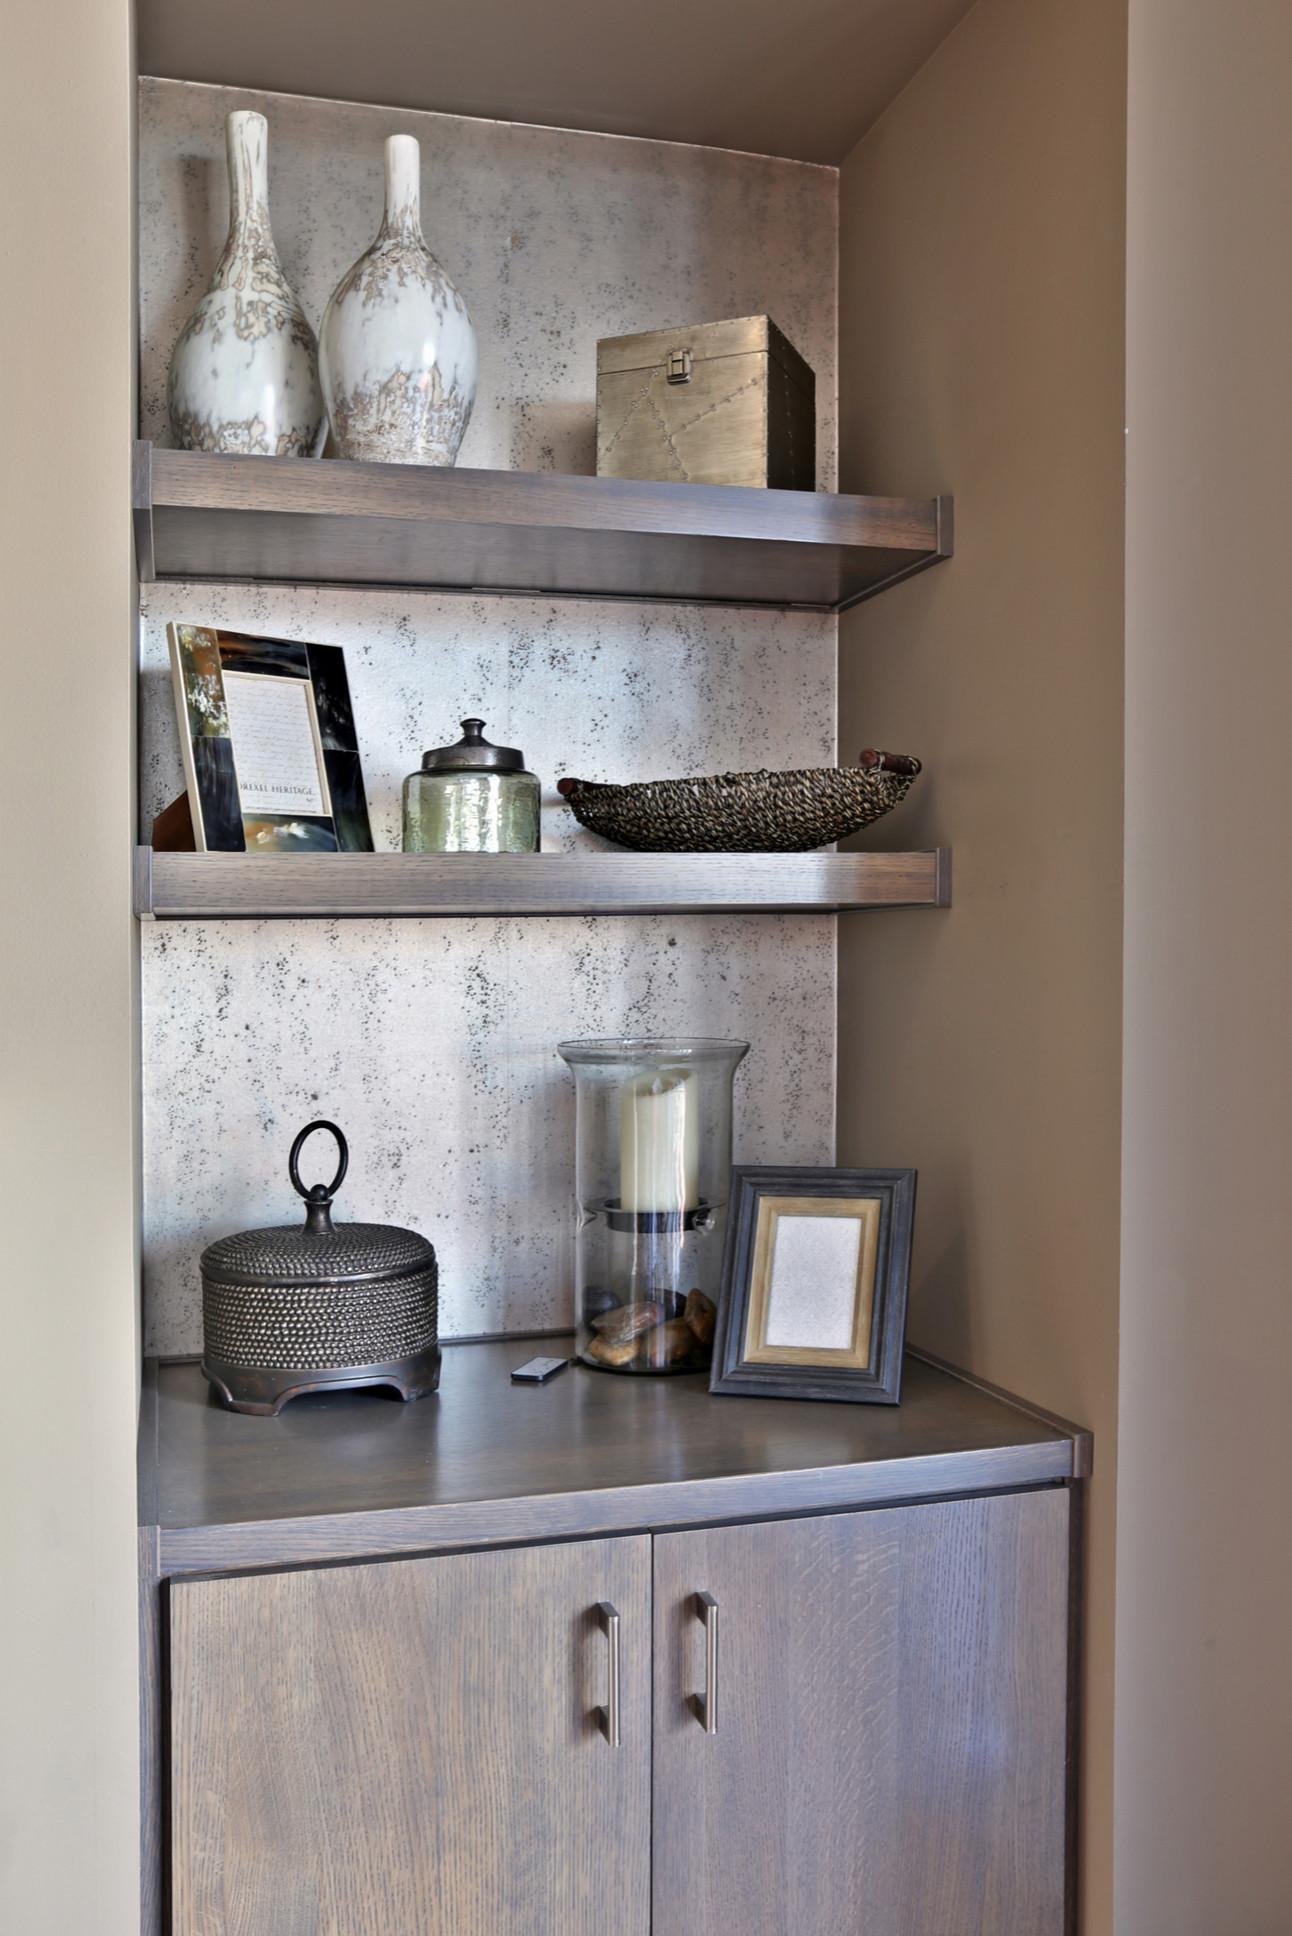 High Rise Kitchen & Interior Remodel by Lori Brock